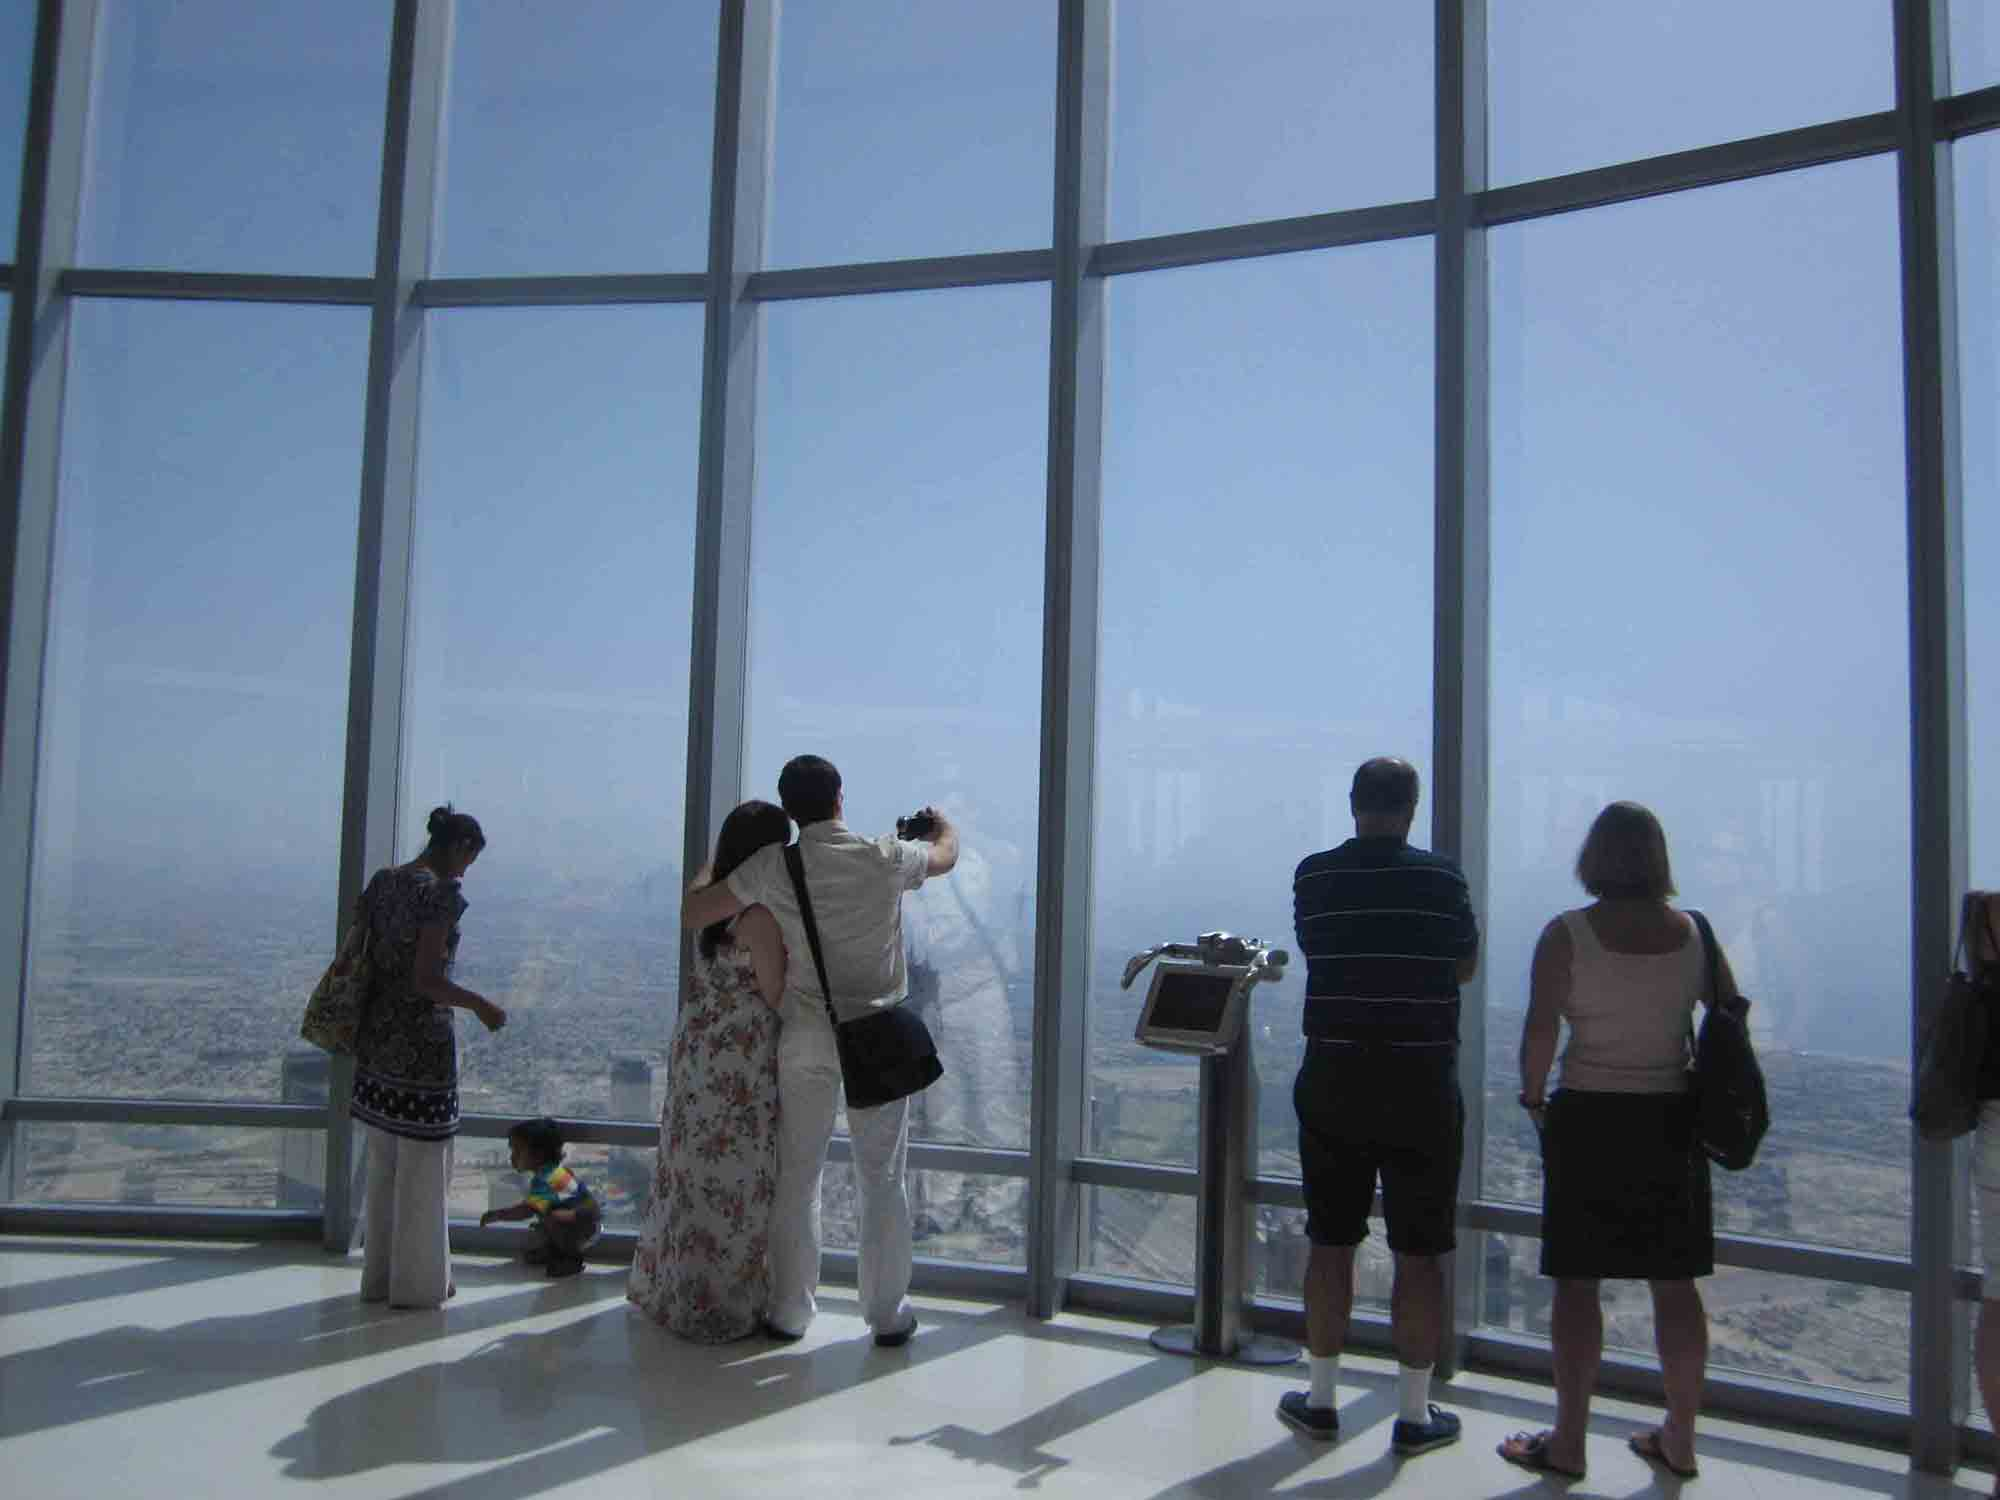 At the Top in Burj Khalifa